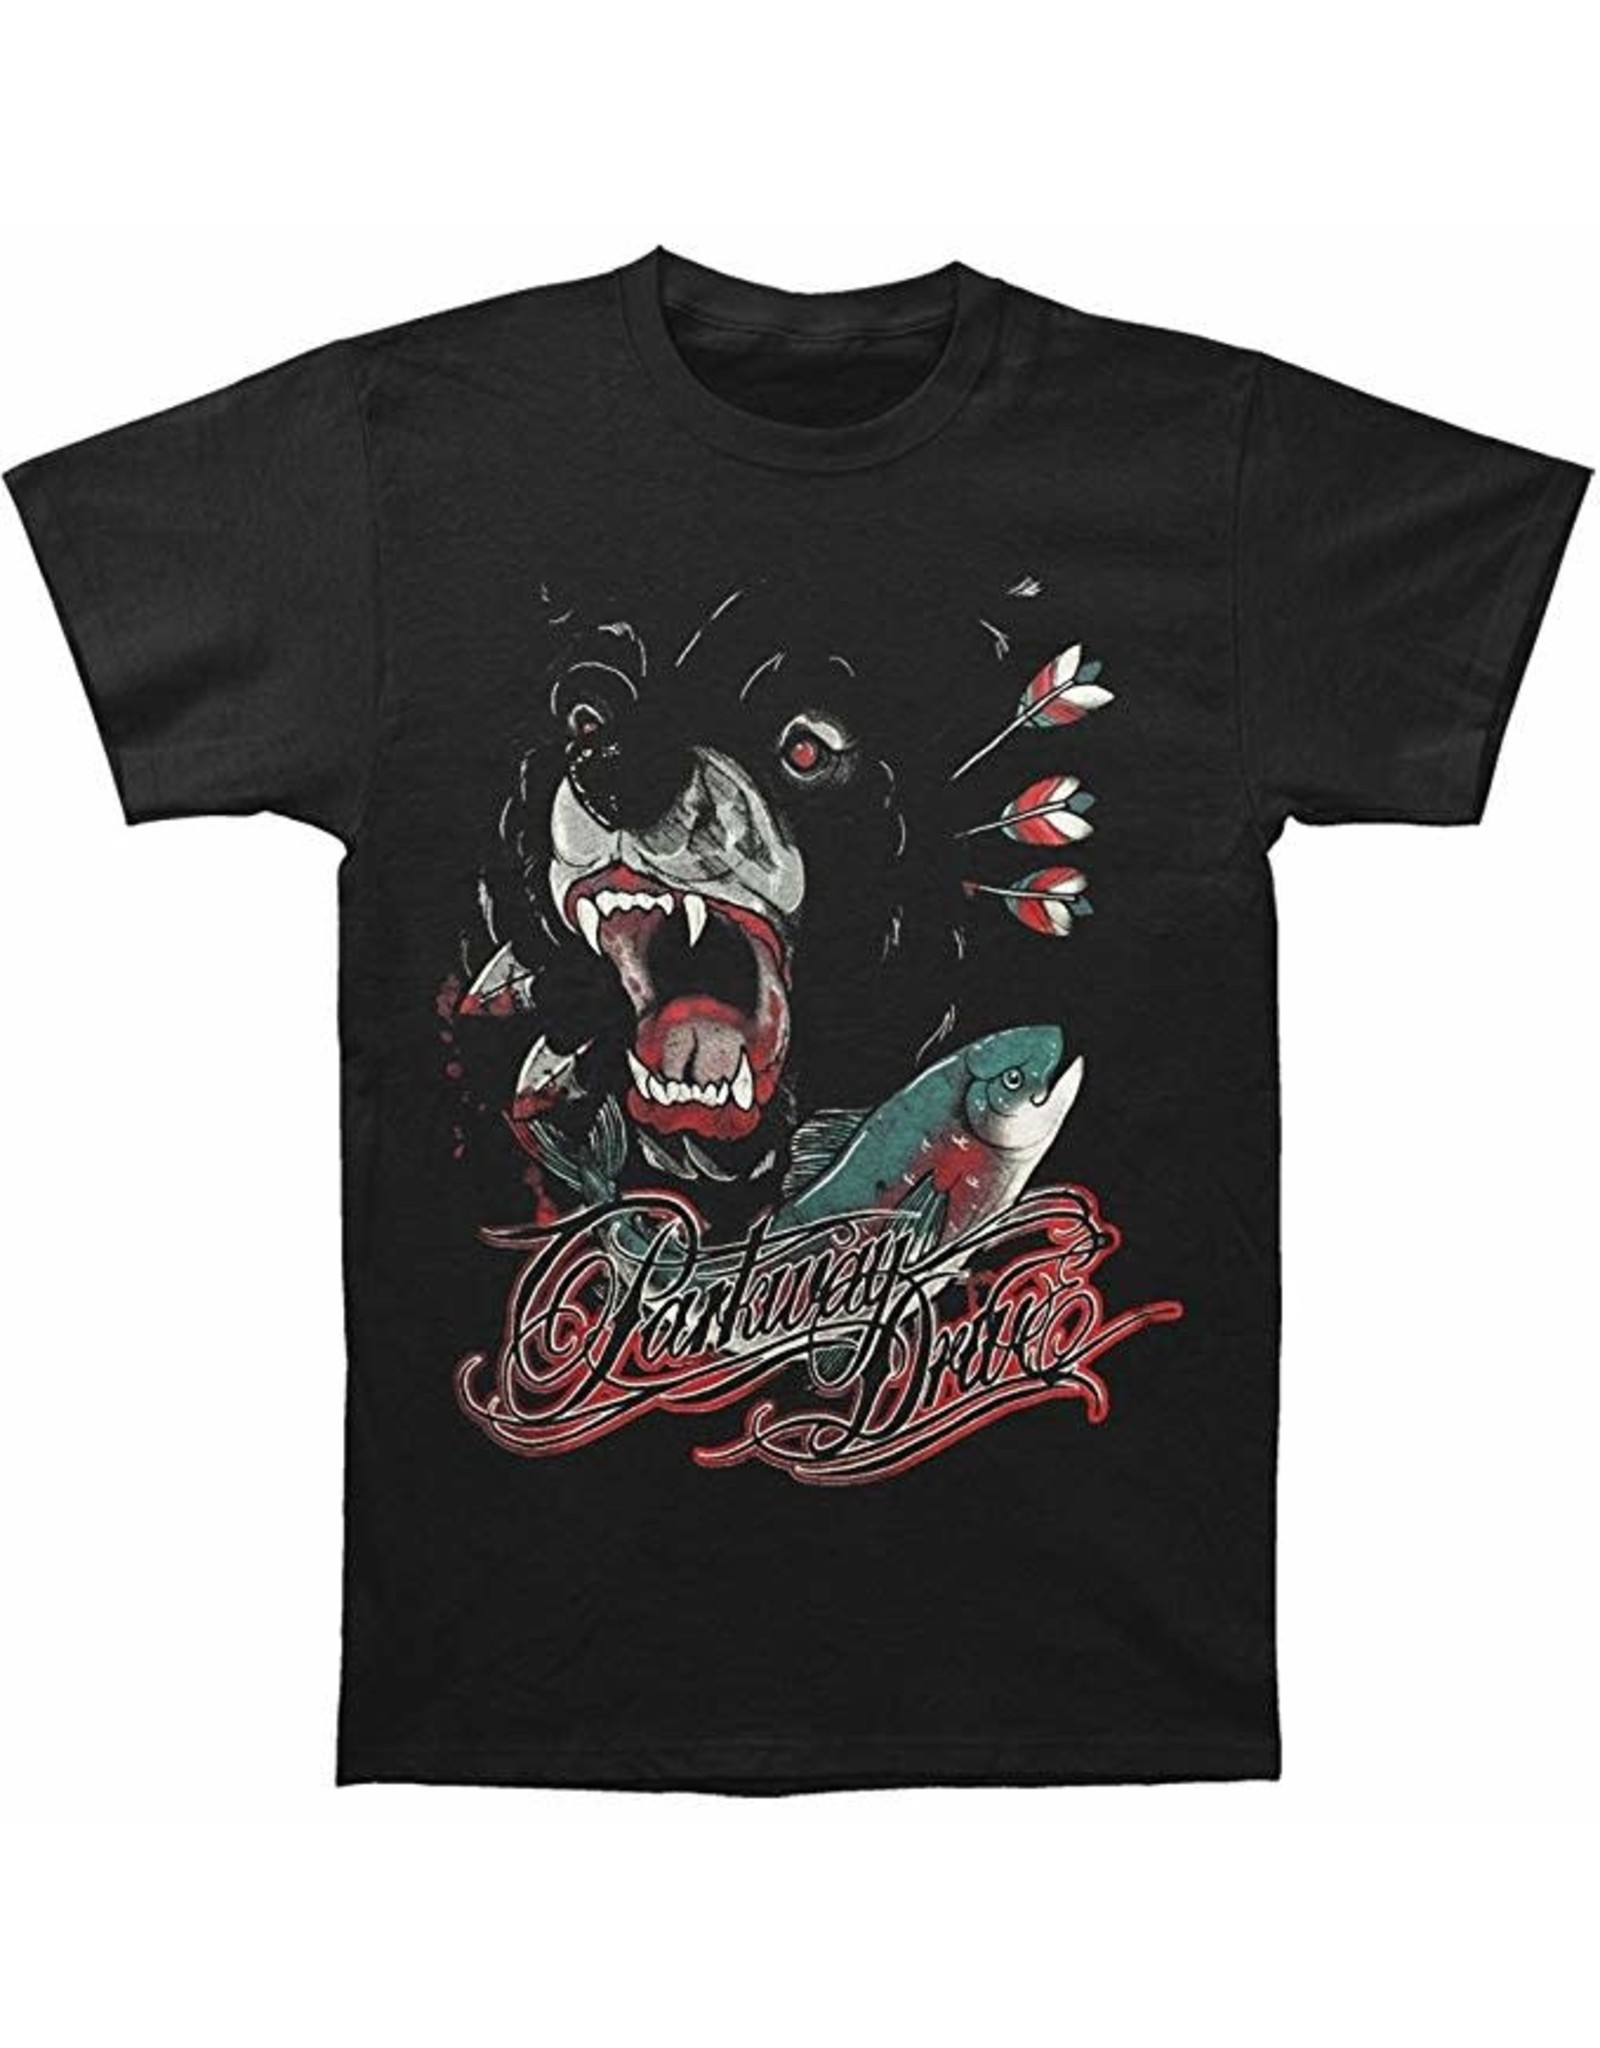 "Parkway Drive ""Bear and Salmon"" T-Shirt"